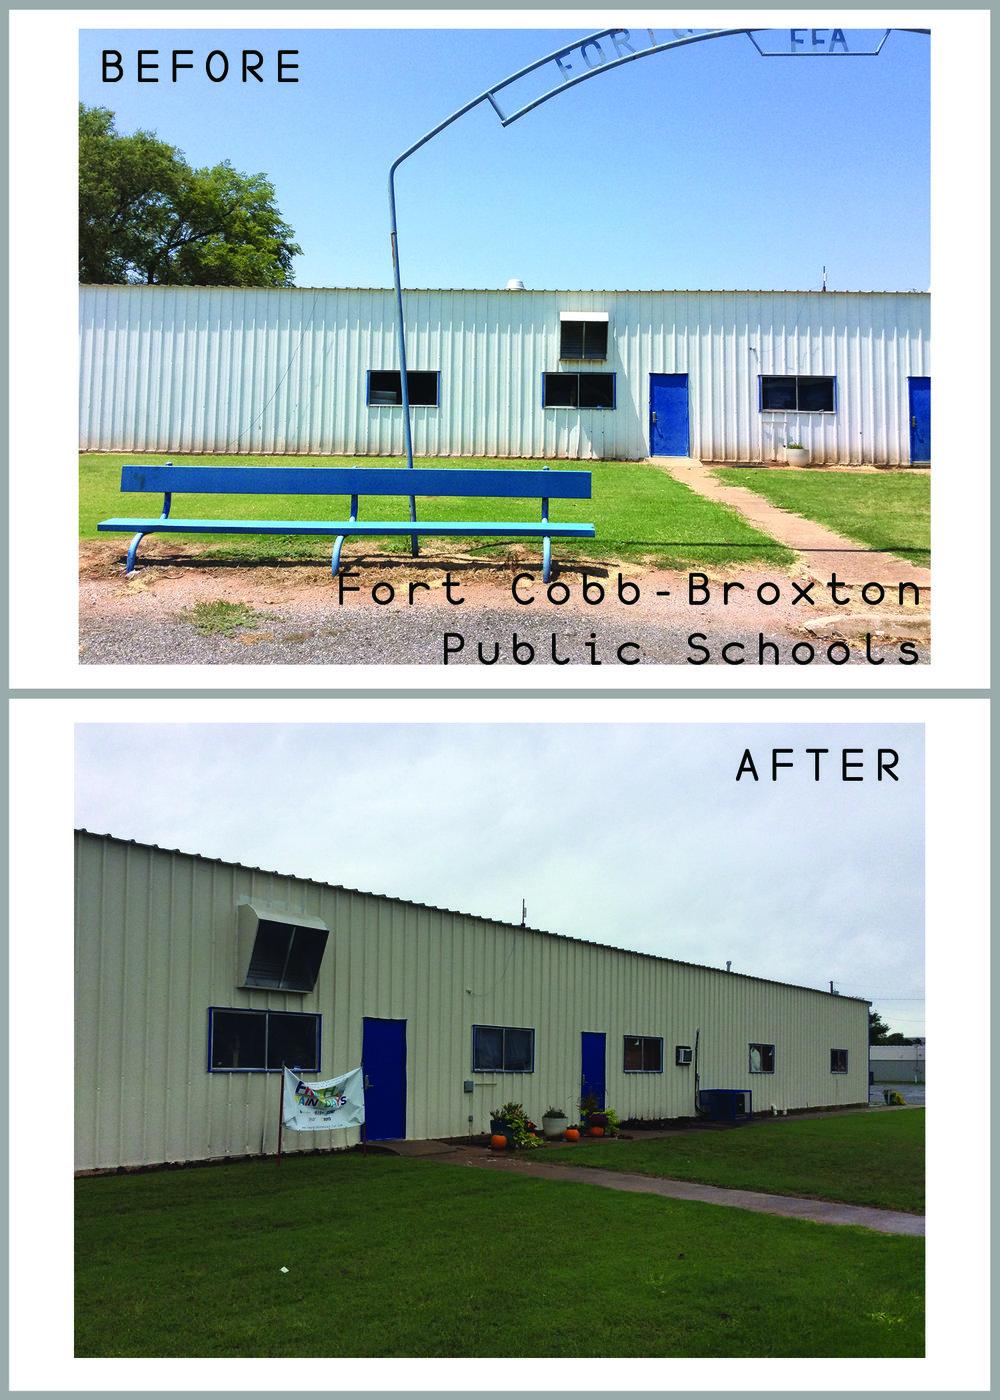 fort cobb-broxton public schools.jpg